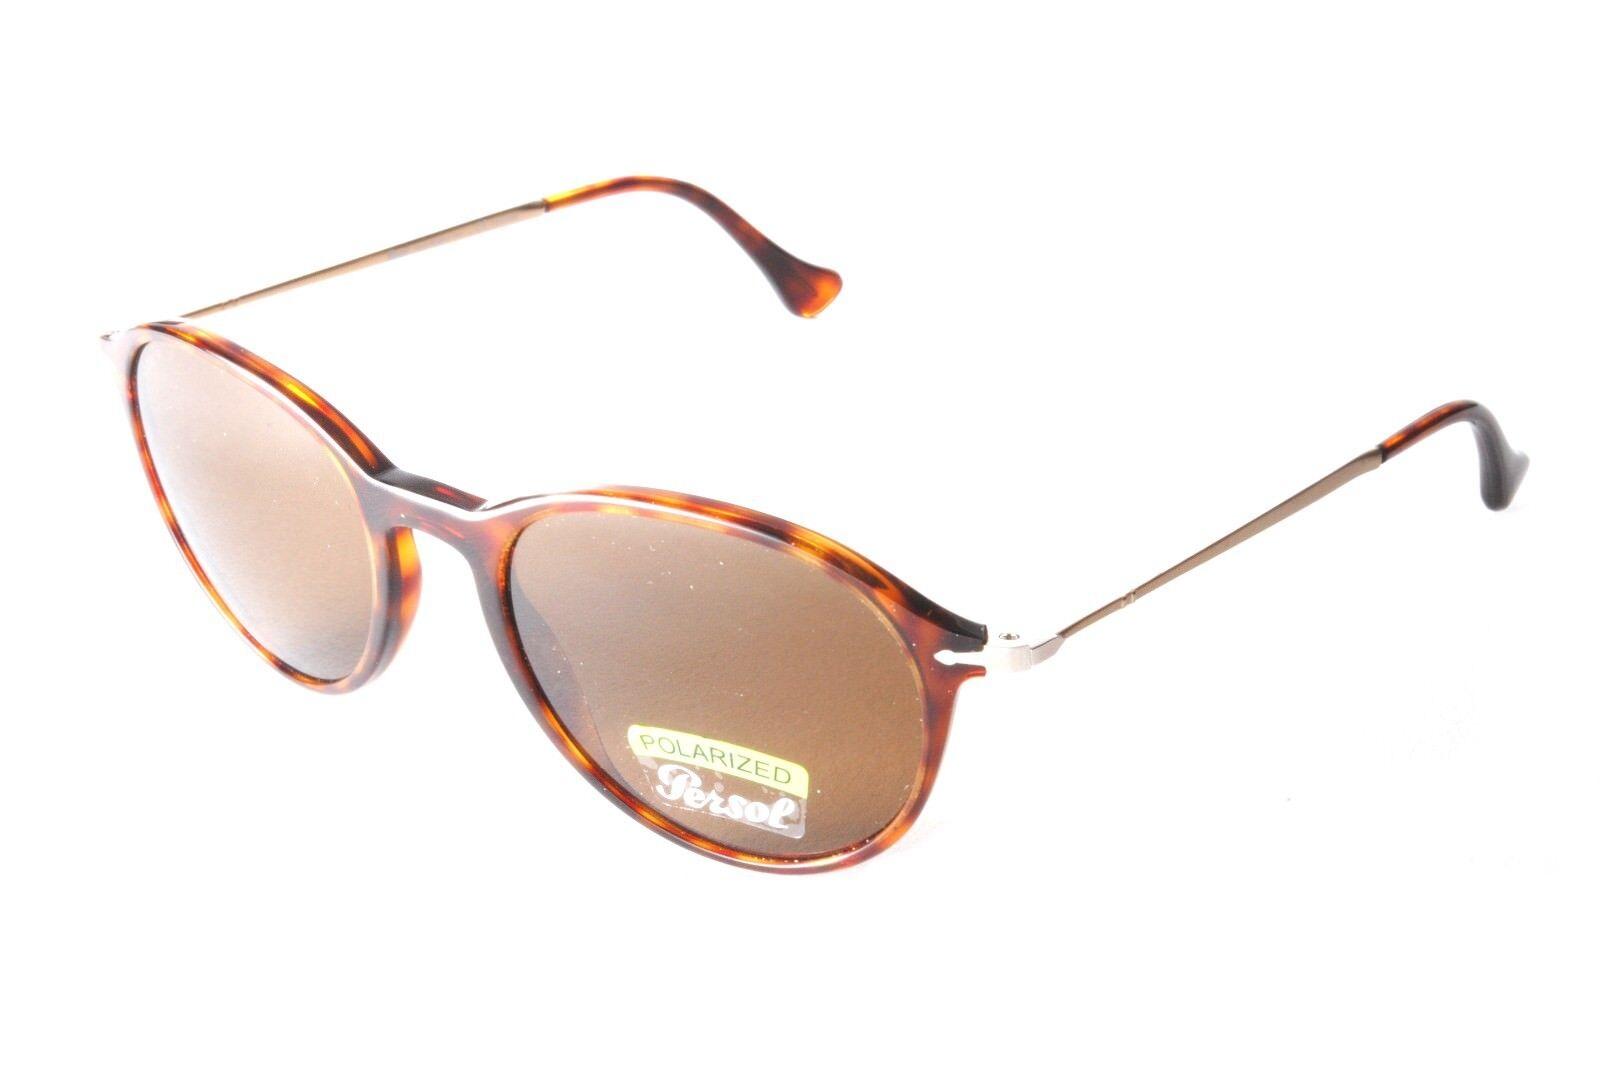 78c556f801 Persol Reflex Edition PO3125S 24 57 Tortoiseshell Gold Polarized Sunglasses